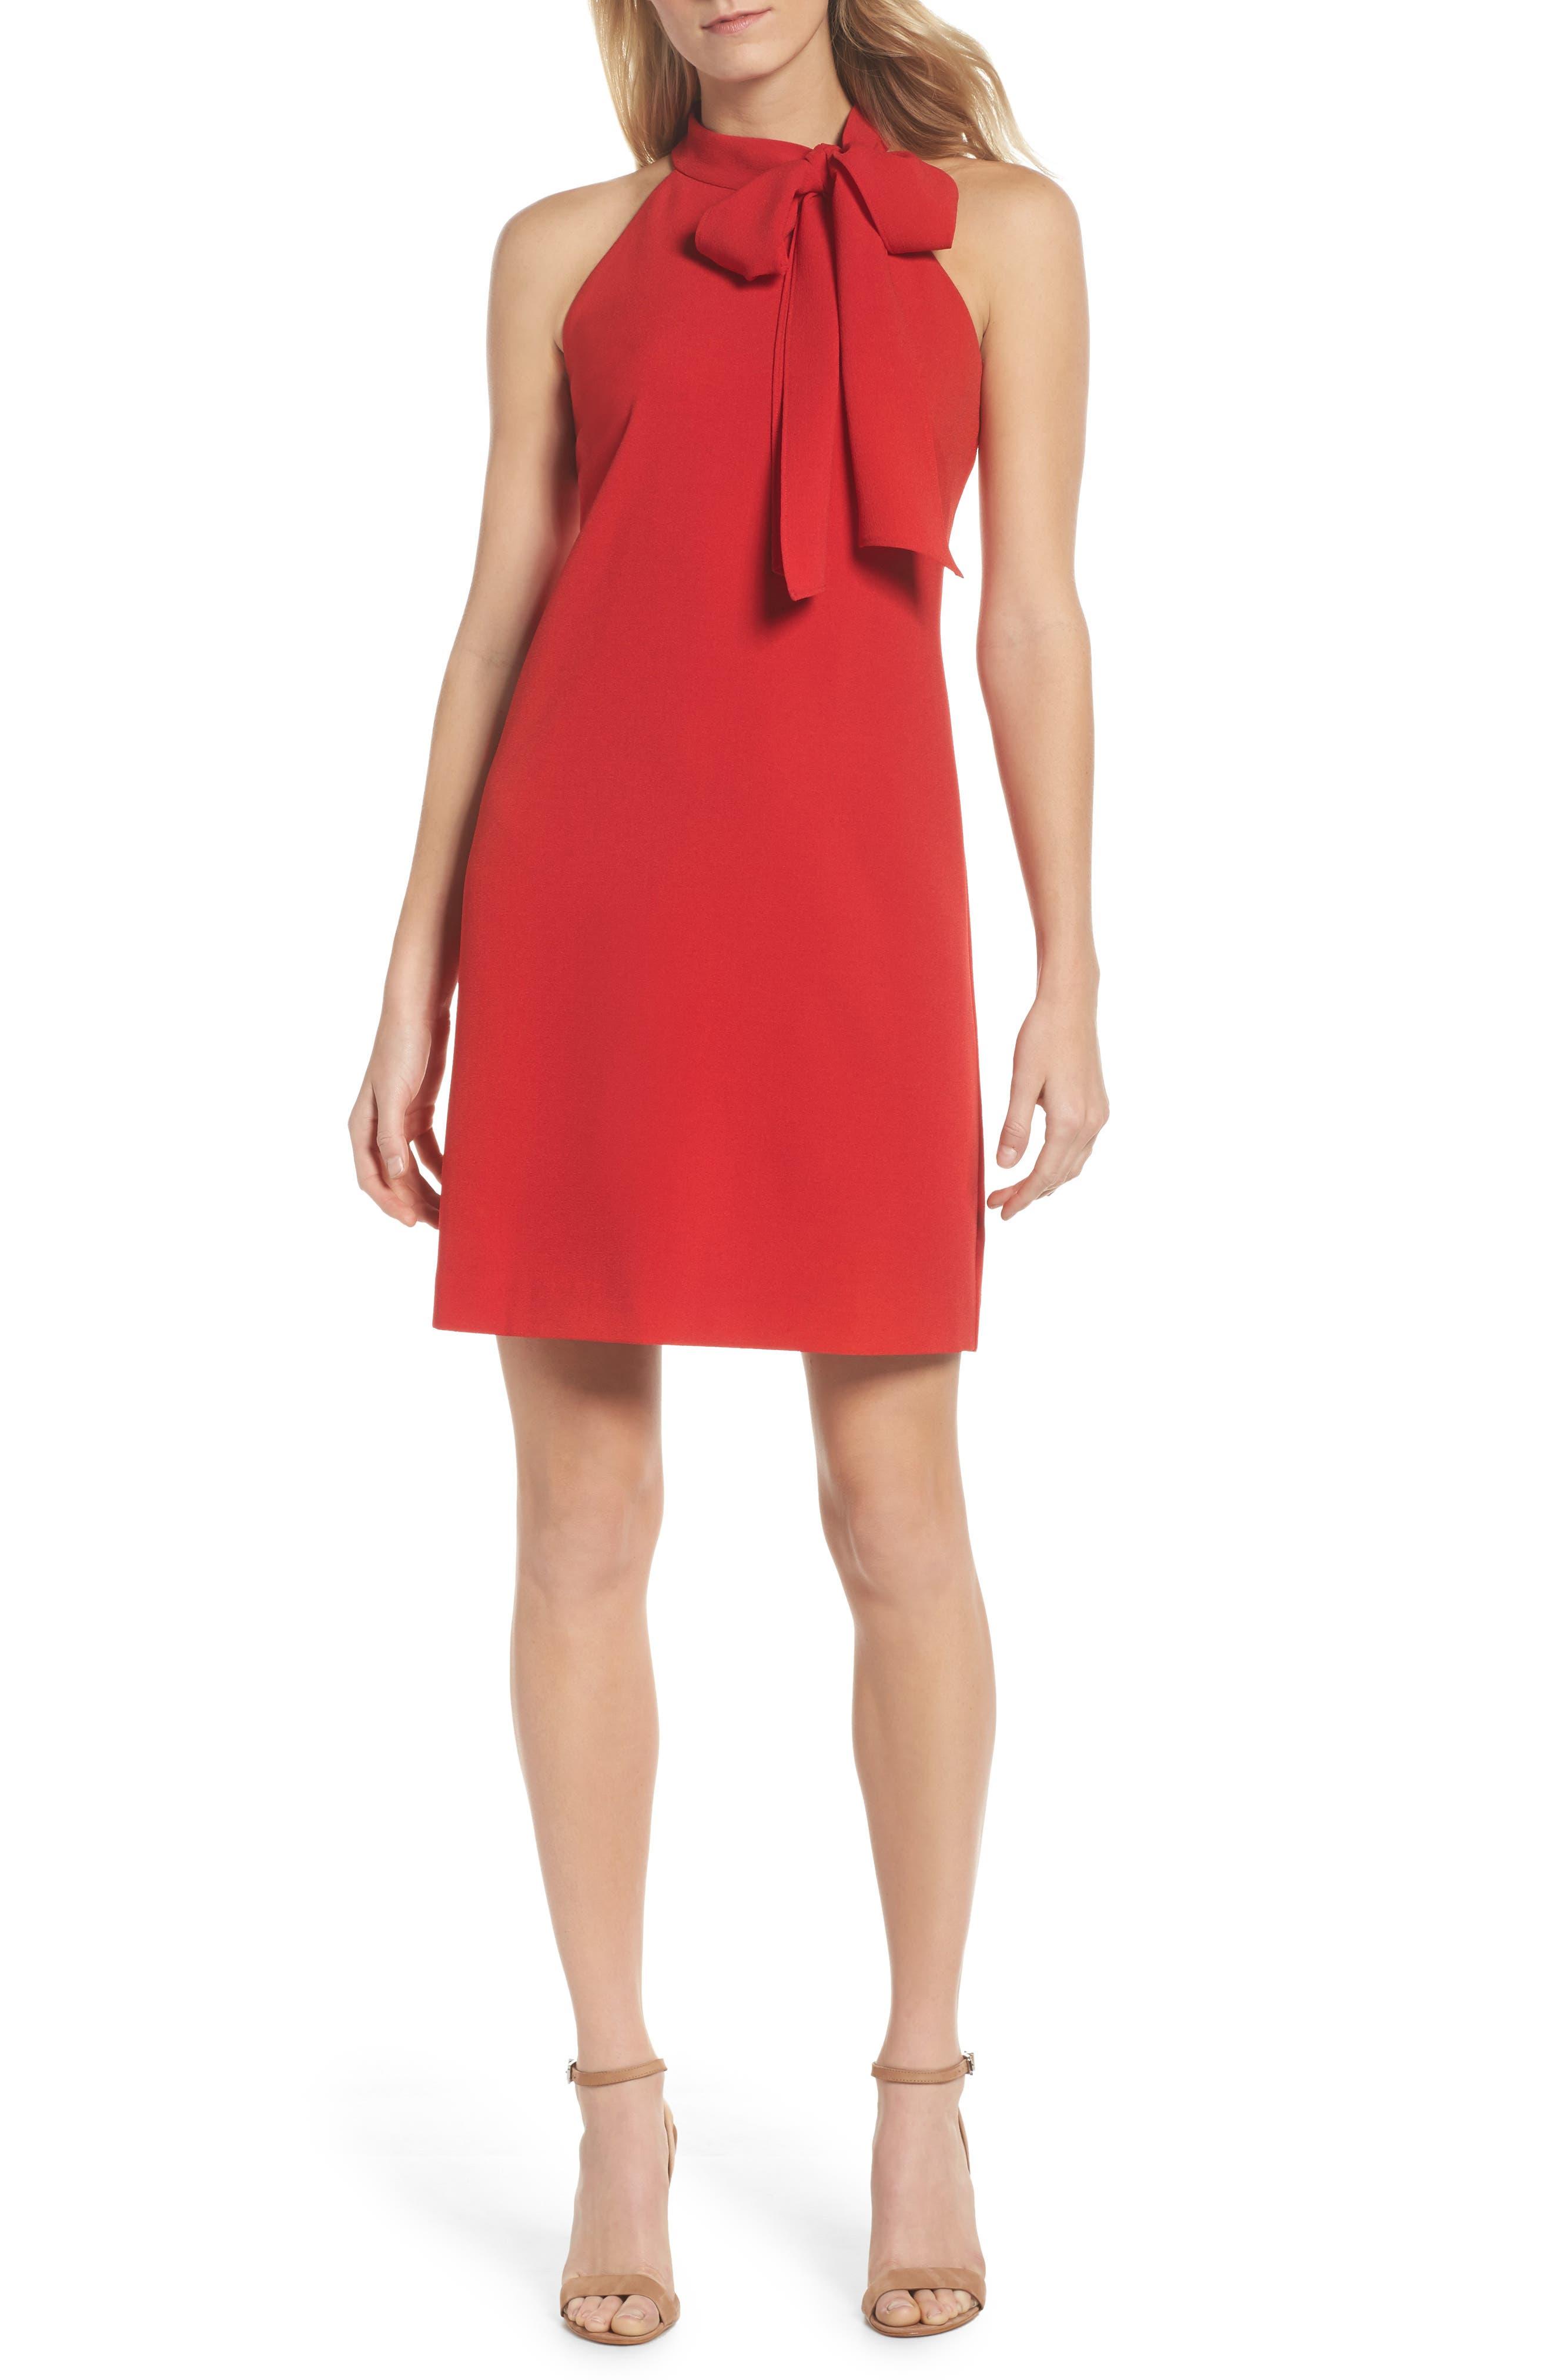 VINCE CAMUTO Halter Tie Neck A-Line Dress, Main, color, RED